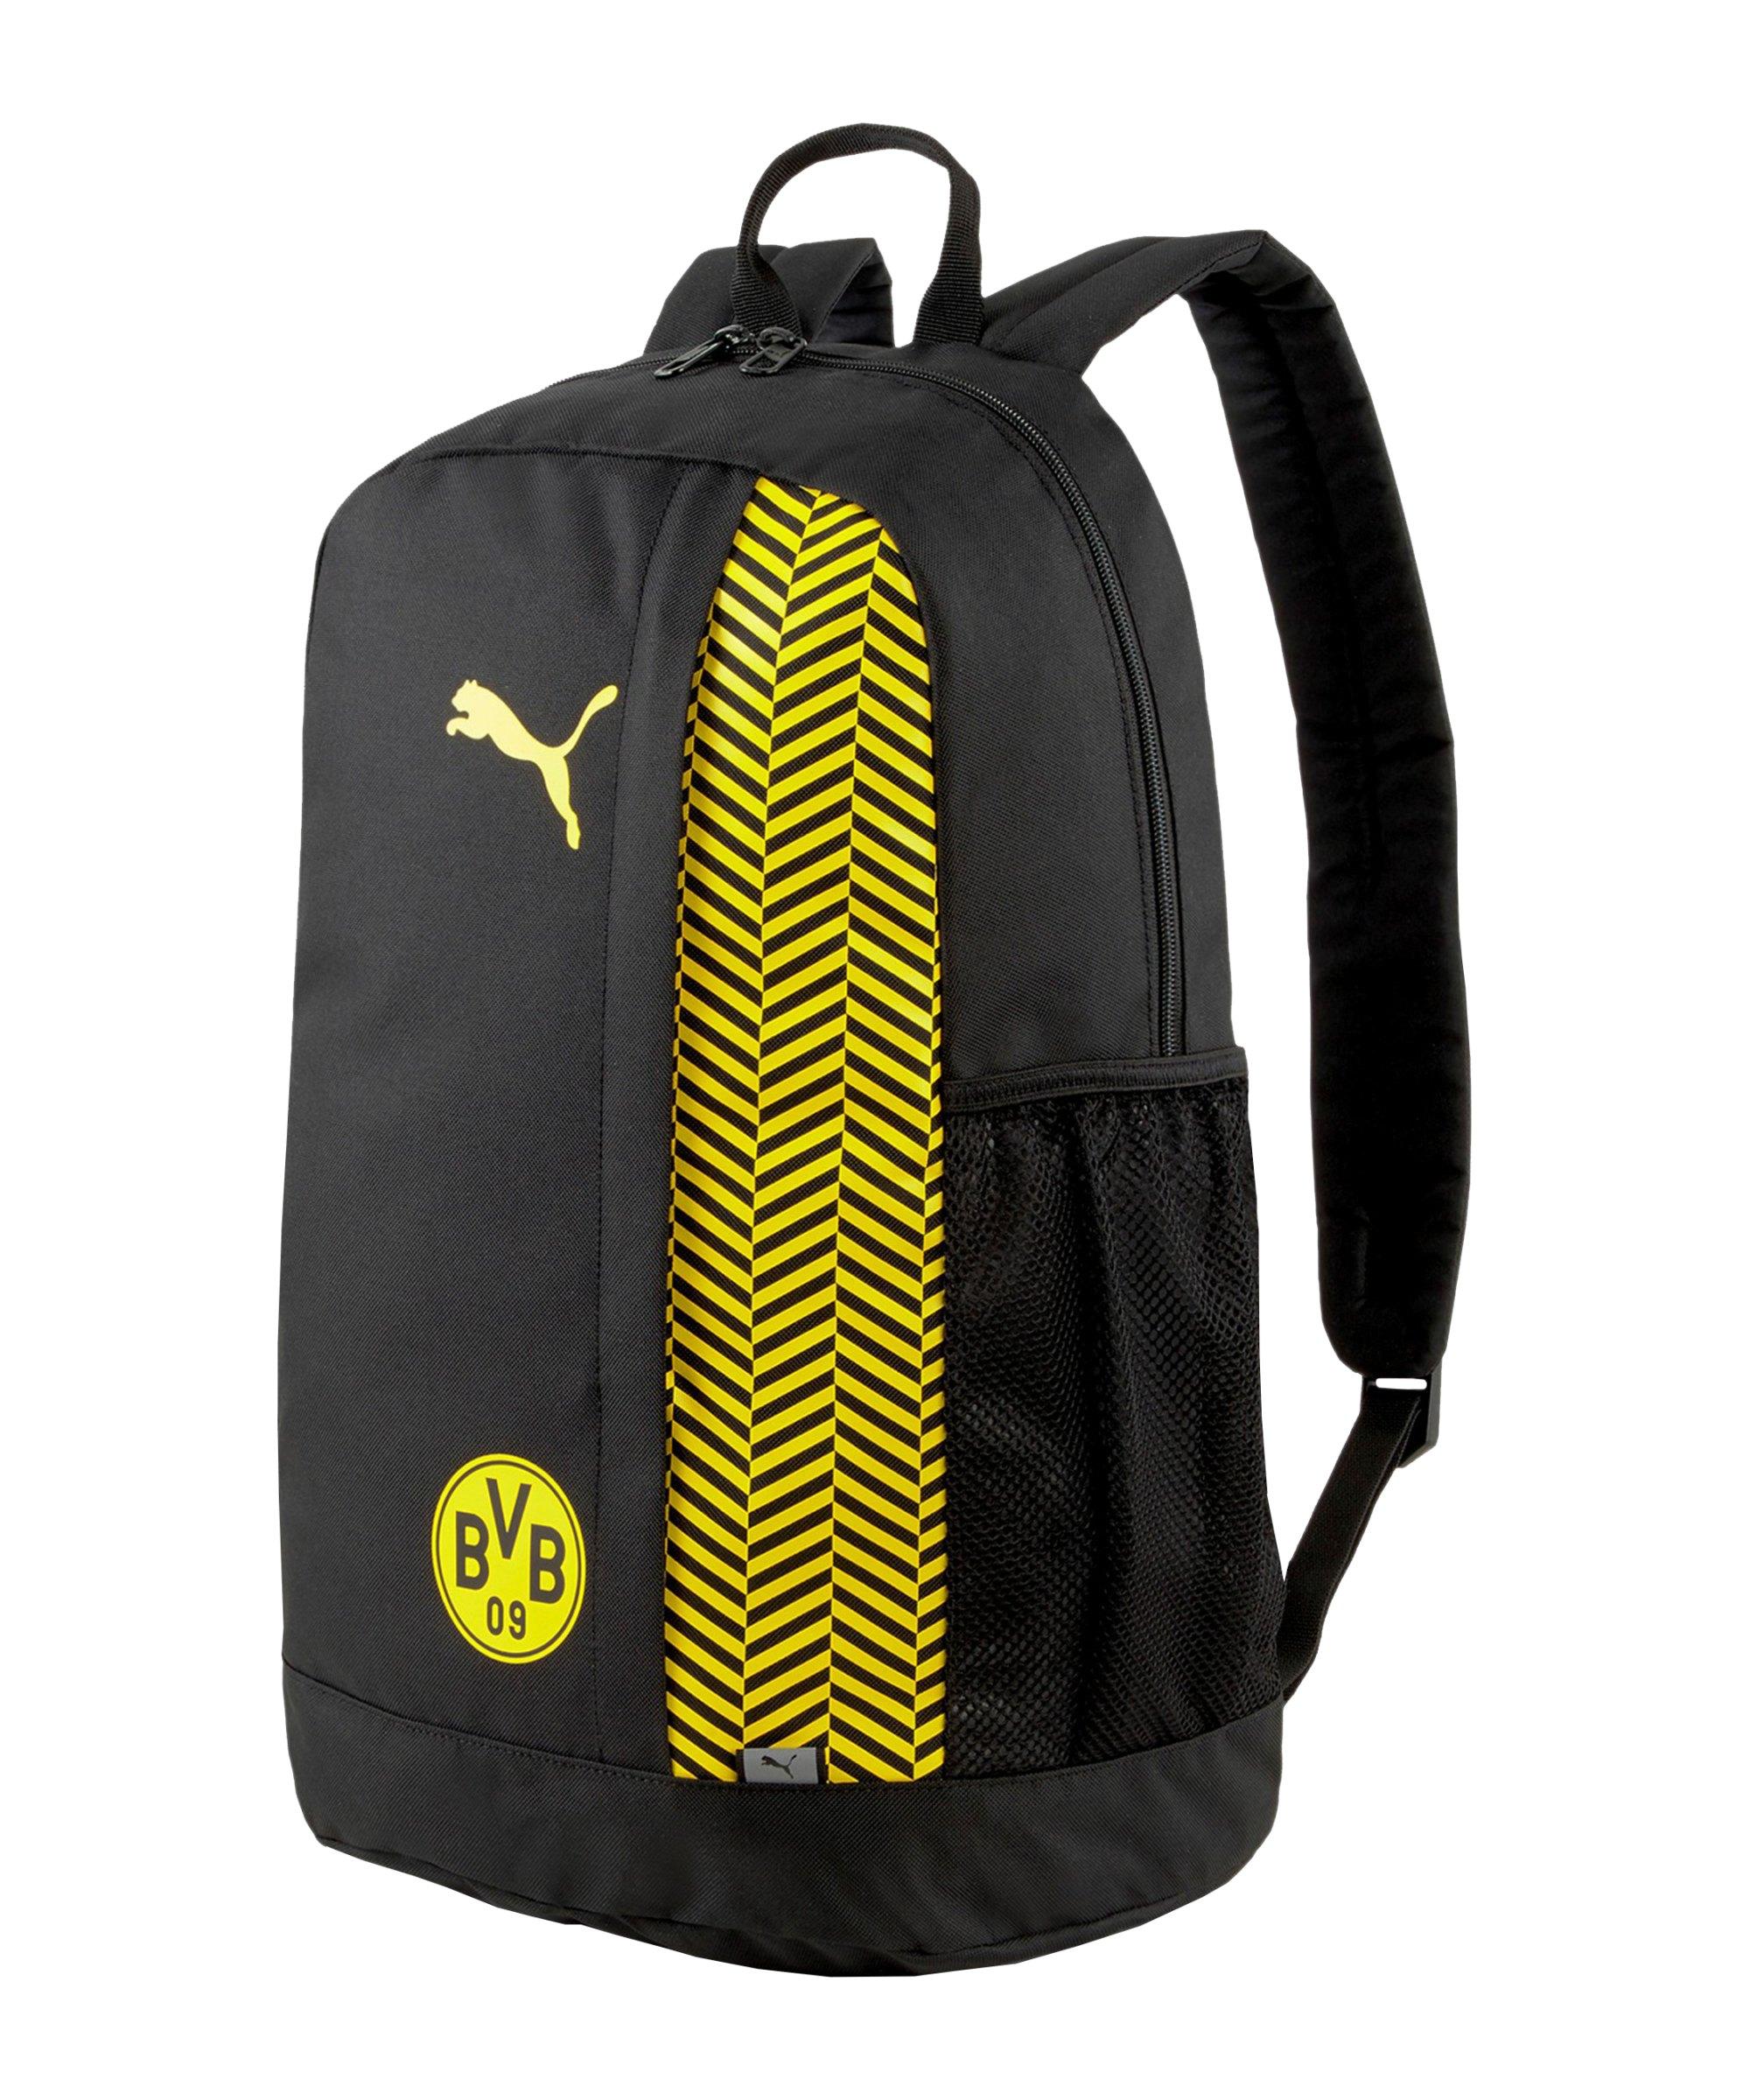 PUMA BVB Dortmund ftblCore Plus Rucksack F03 - schwarz